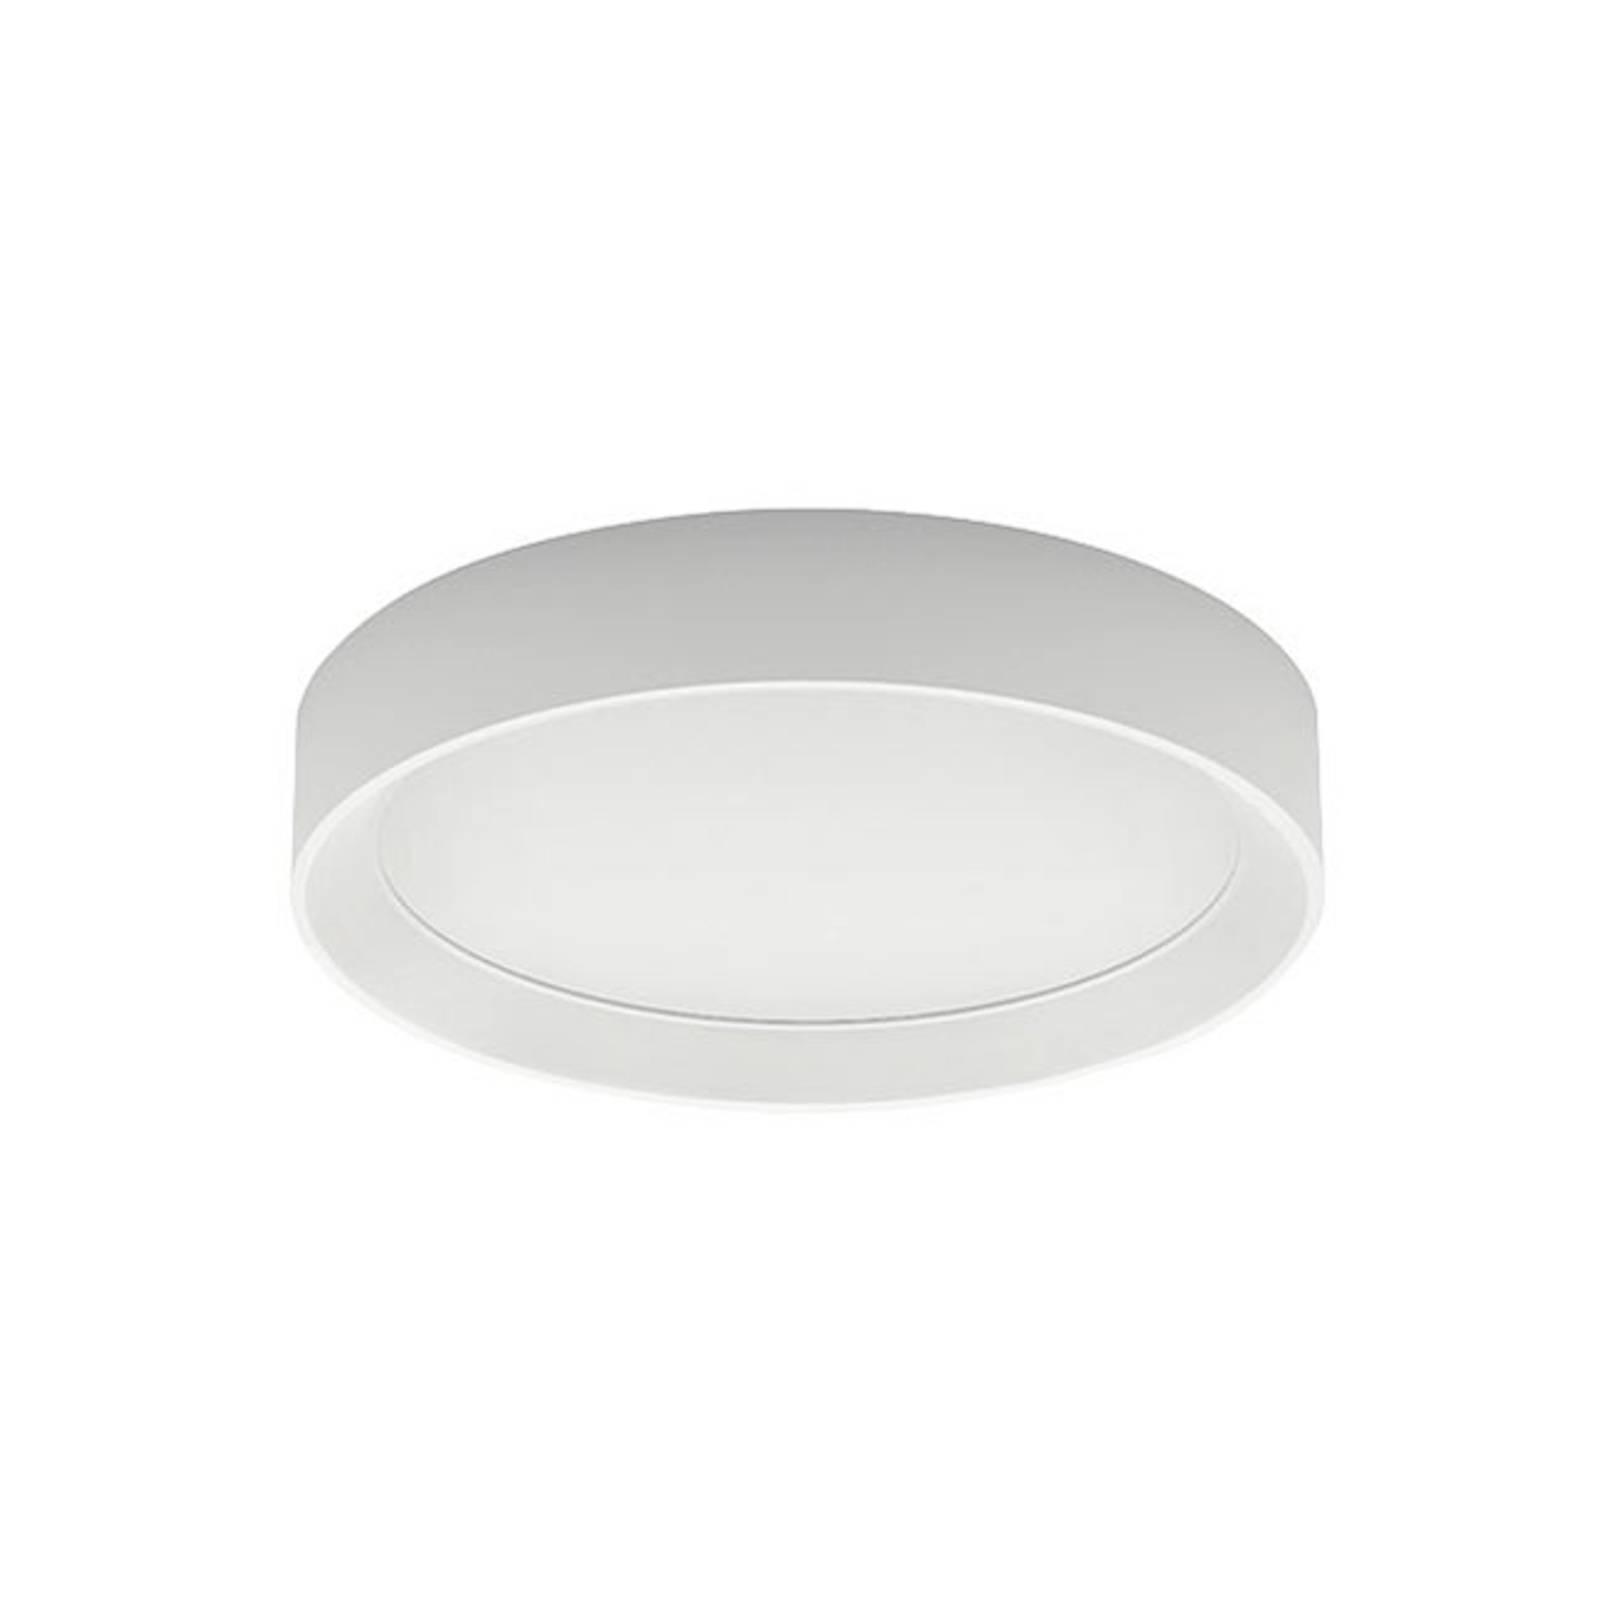 LED-kattovalaisin Tara R, pyöreä, Ø 31 cm